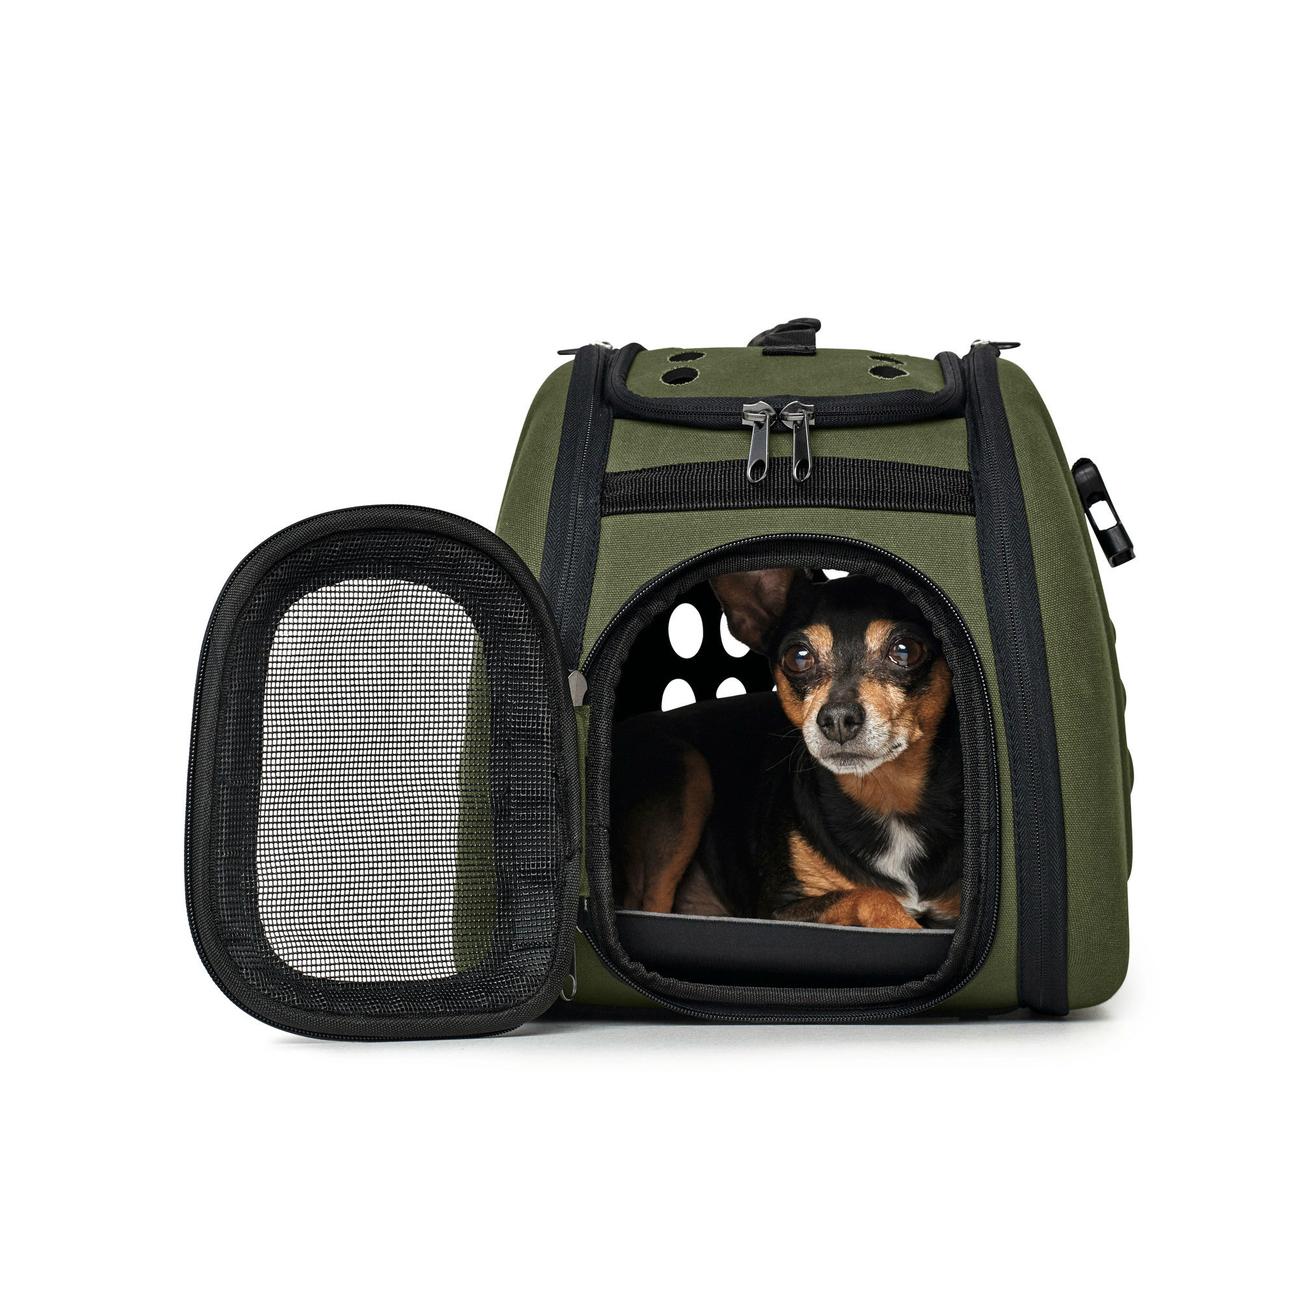 Hunter Hunde Tragetasche Nizza 65800, Bild 9